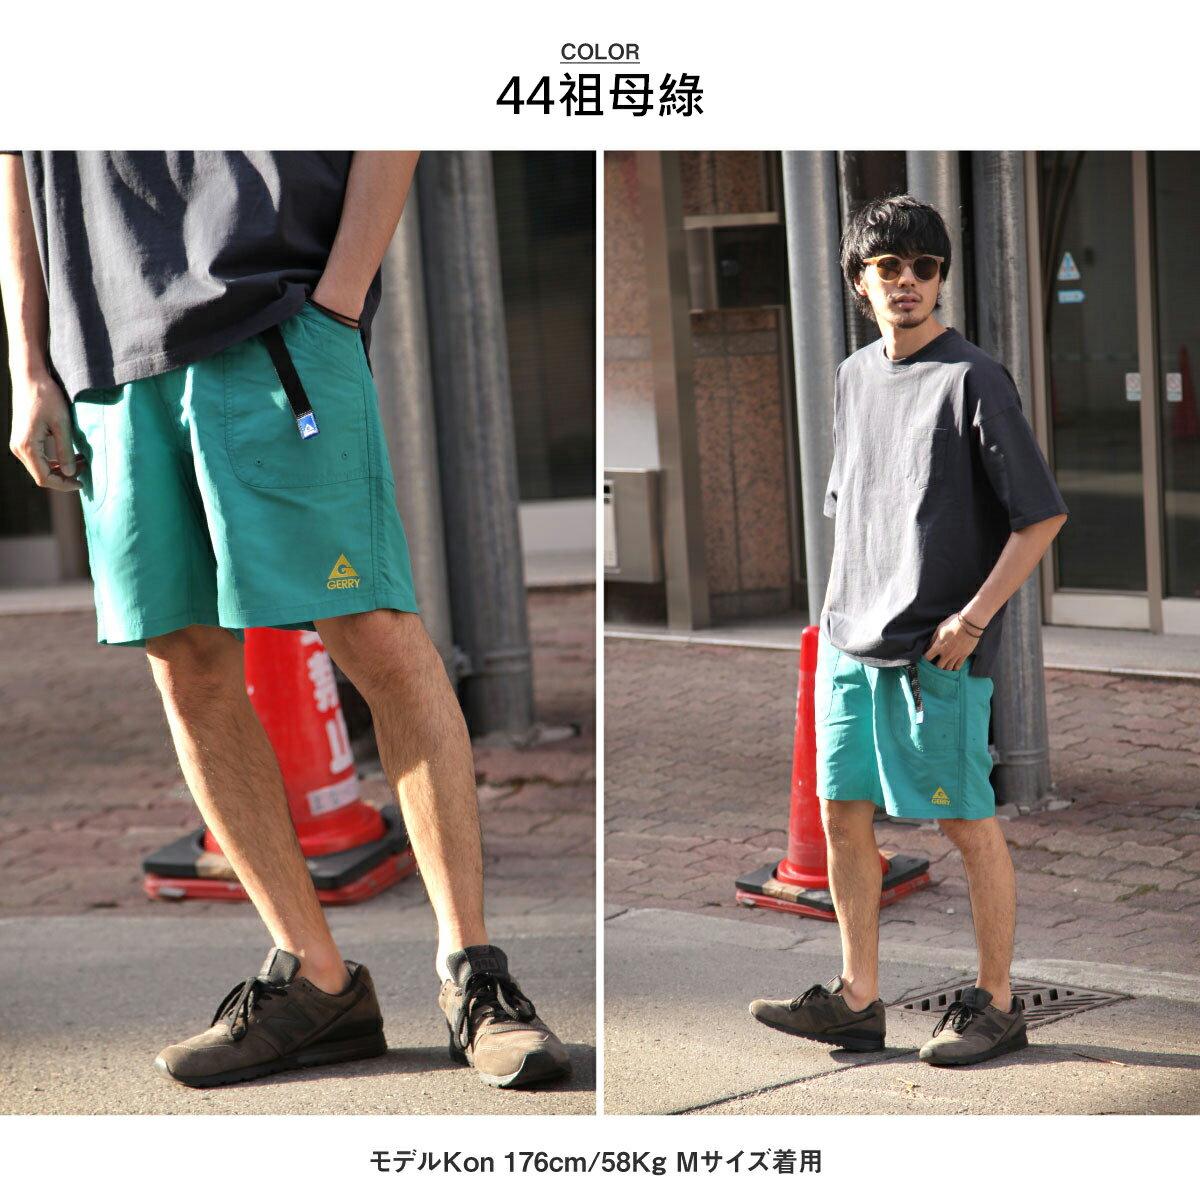 【New】GERRY 登山機能短褲 6